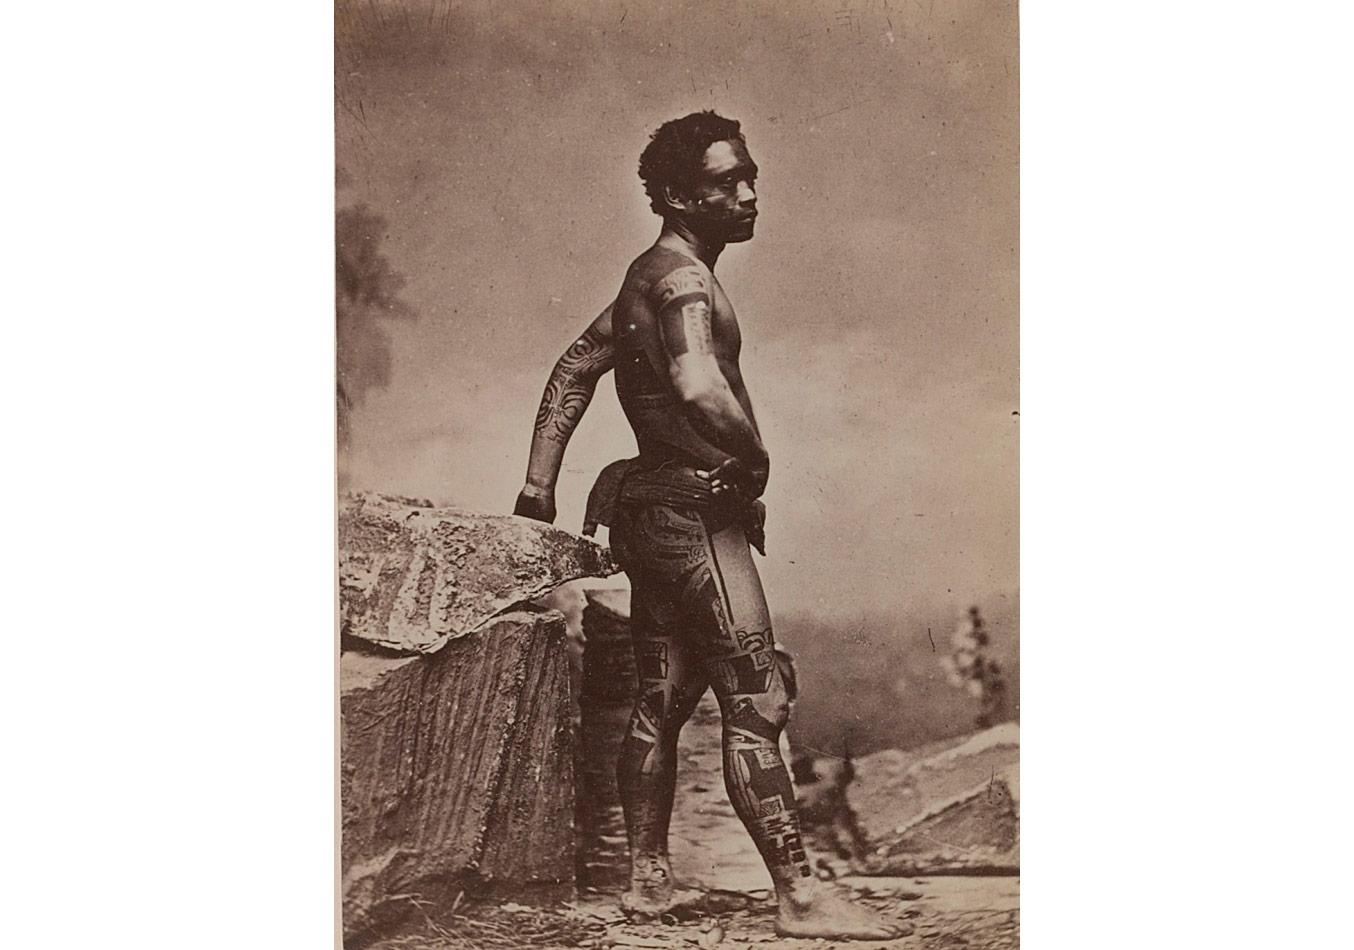 S.Hoare, Markiz yerlisi, 1880-1885 © Musée du quai Branly / Photo Scala, Floransa